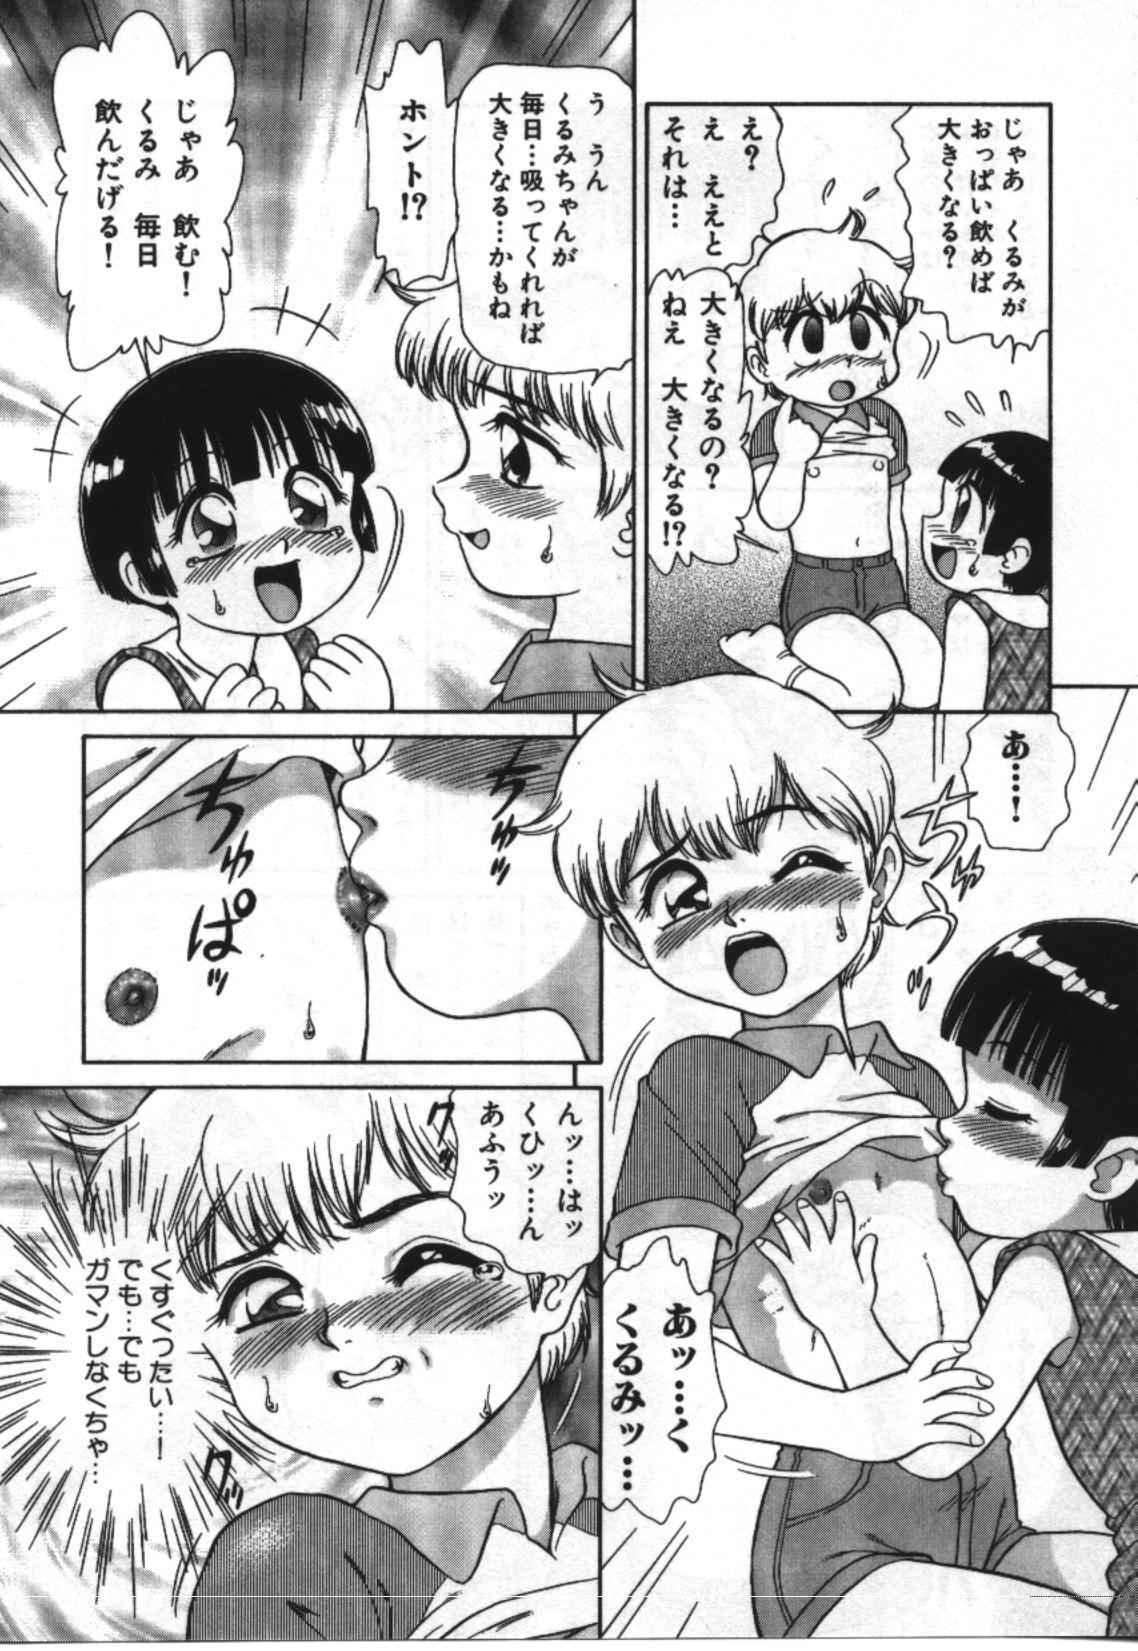 Imouto Koishi 2 15